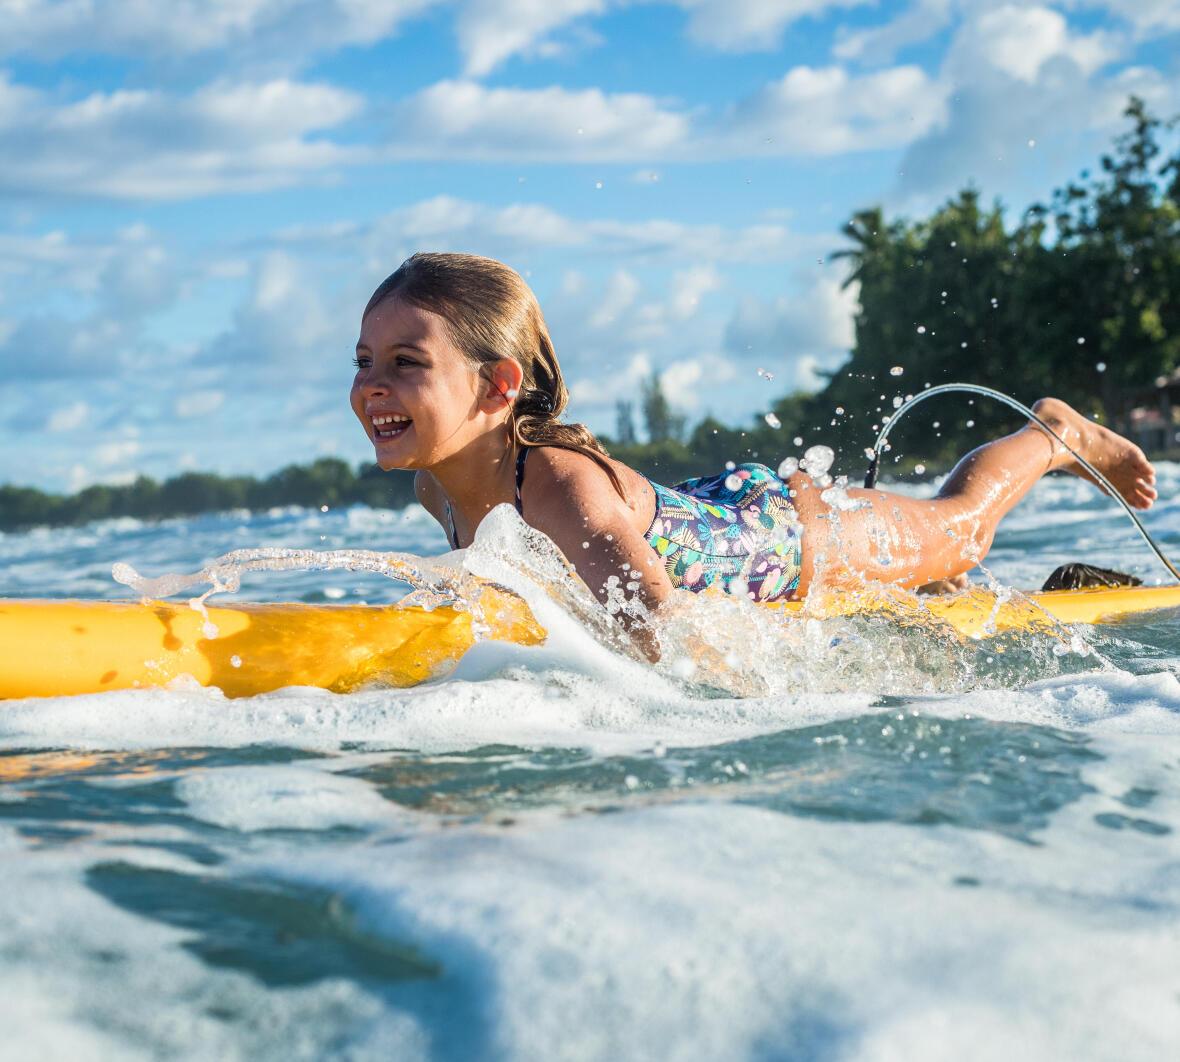 enfant surf rentrée sport